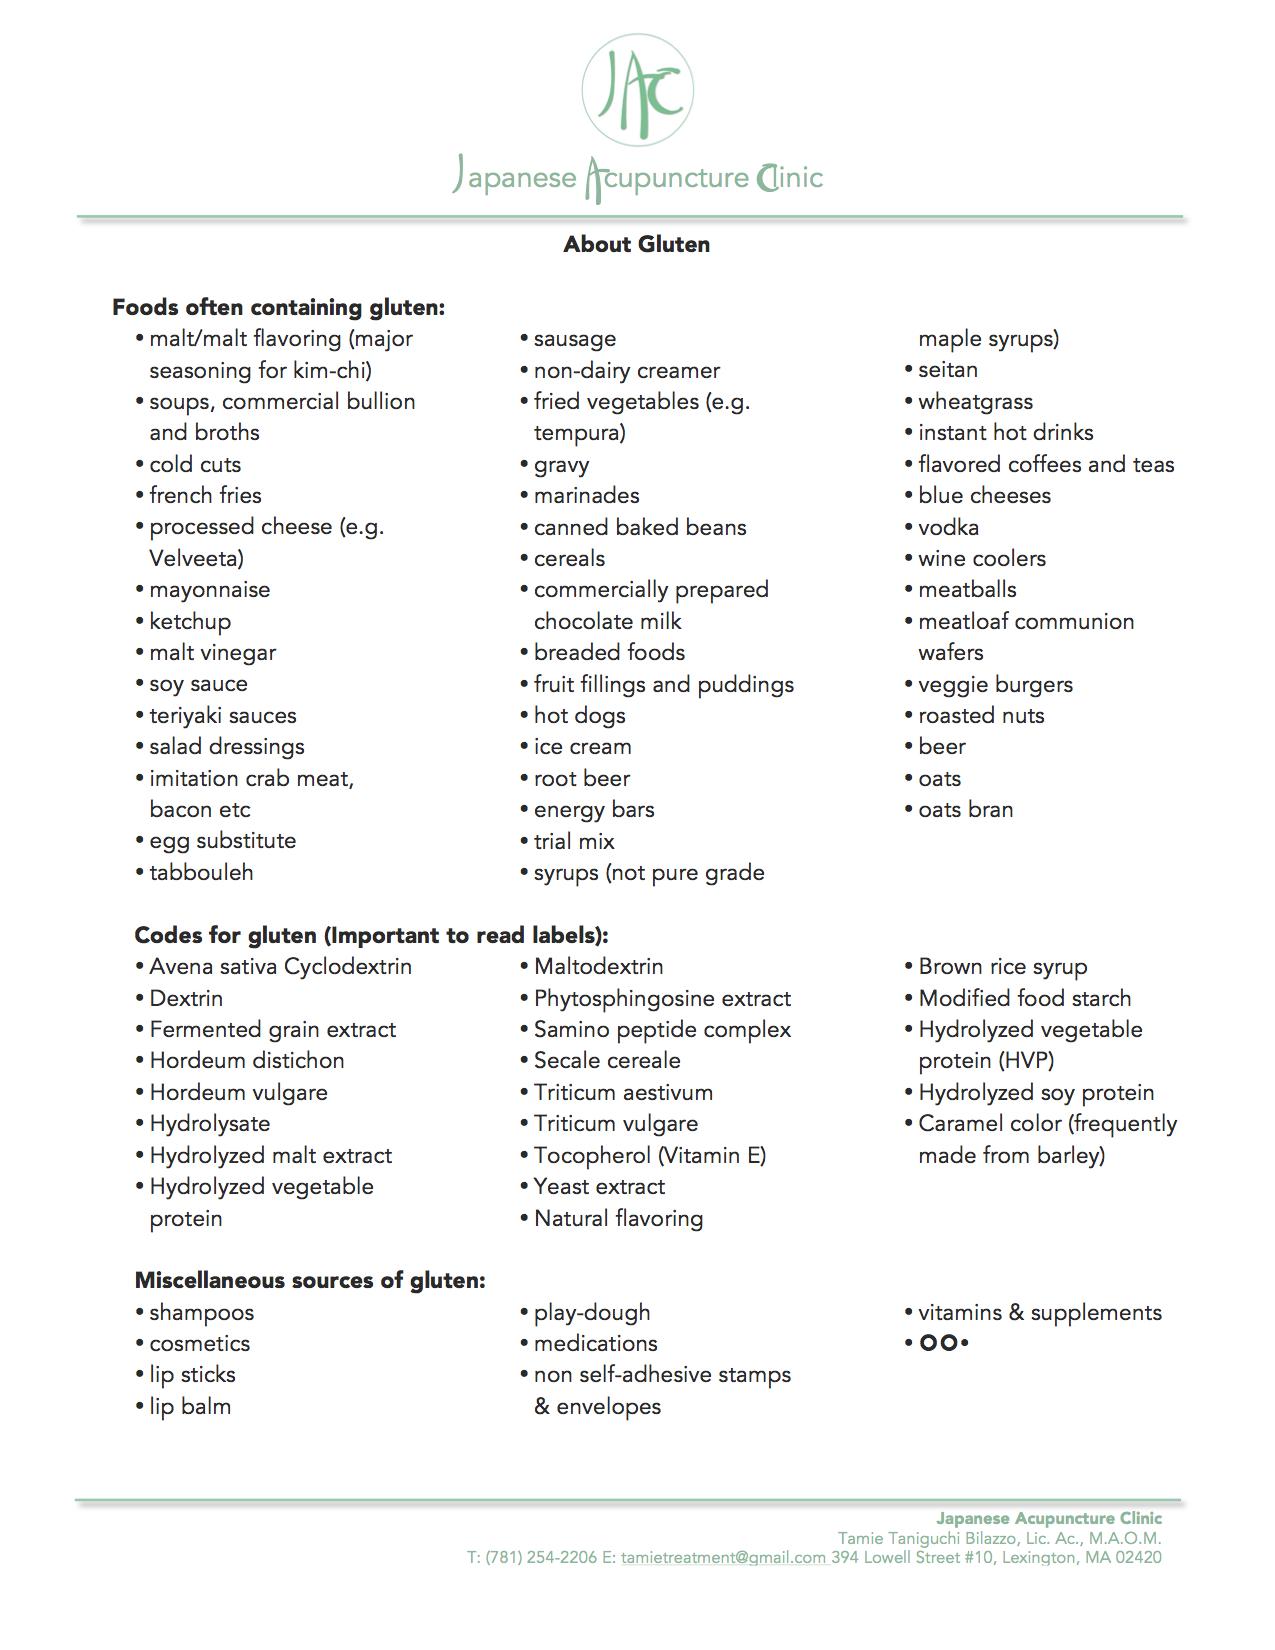 Gluten Sensitivity & Celiac Disease - Japanese Acupuncture